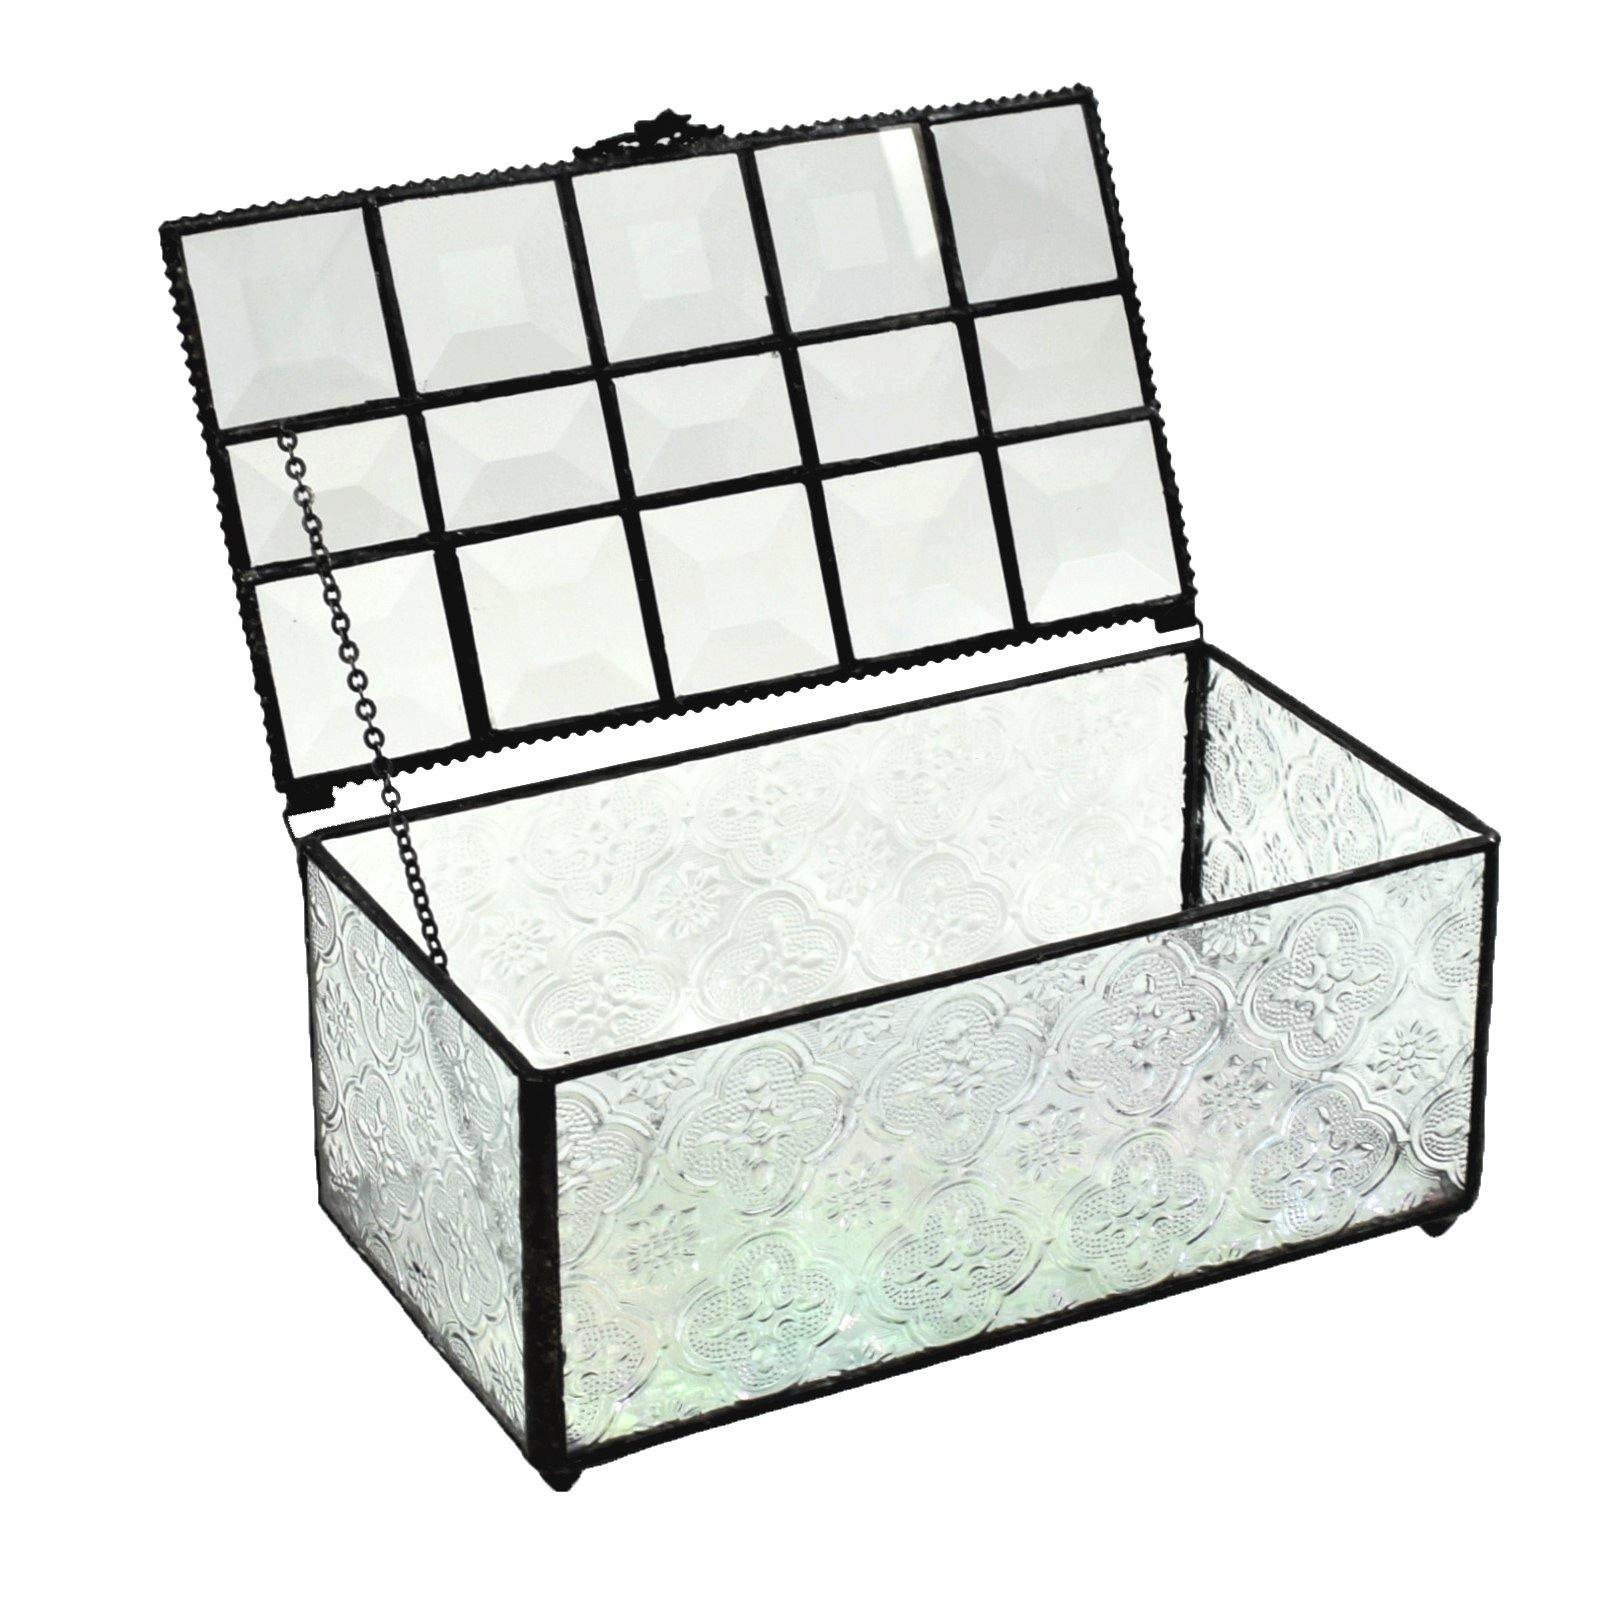 J Devlin Box 370 Large Glass Box Decorative Keepsake Jewelry Display Vintage Stained Glass Vanity Decor